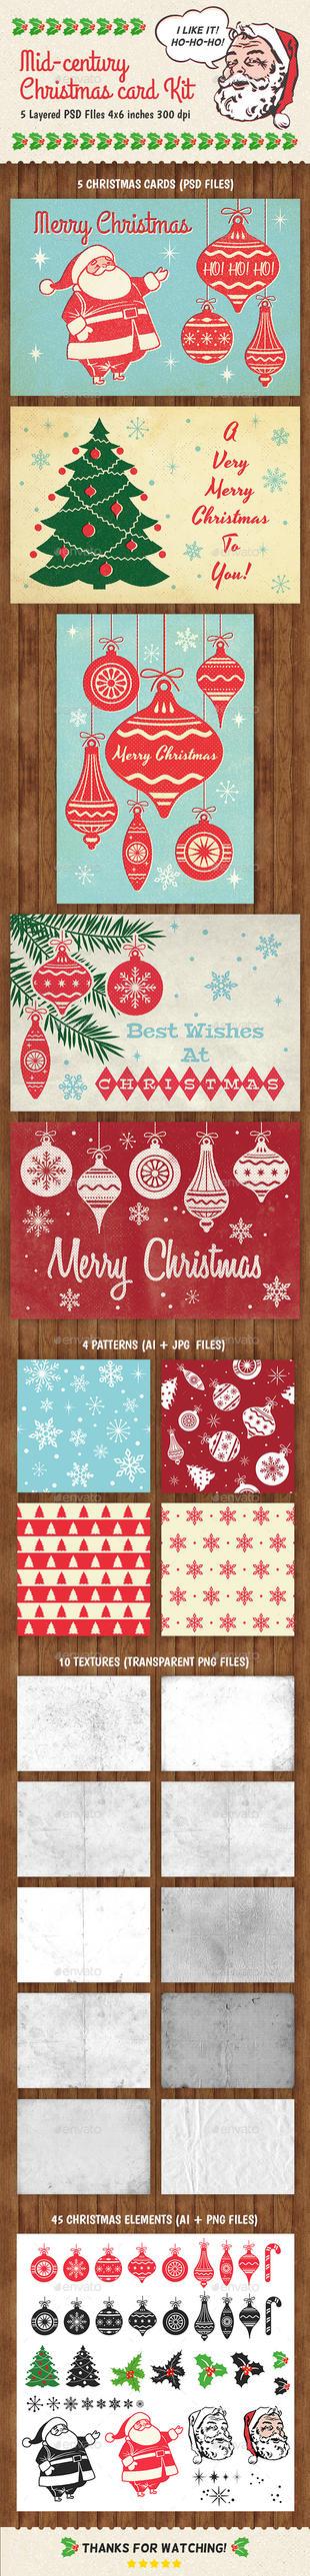 Mid-Century Christmas Card Kit by ottoson